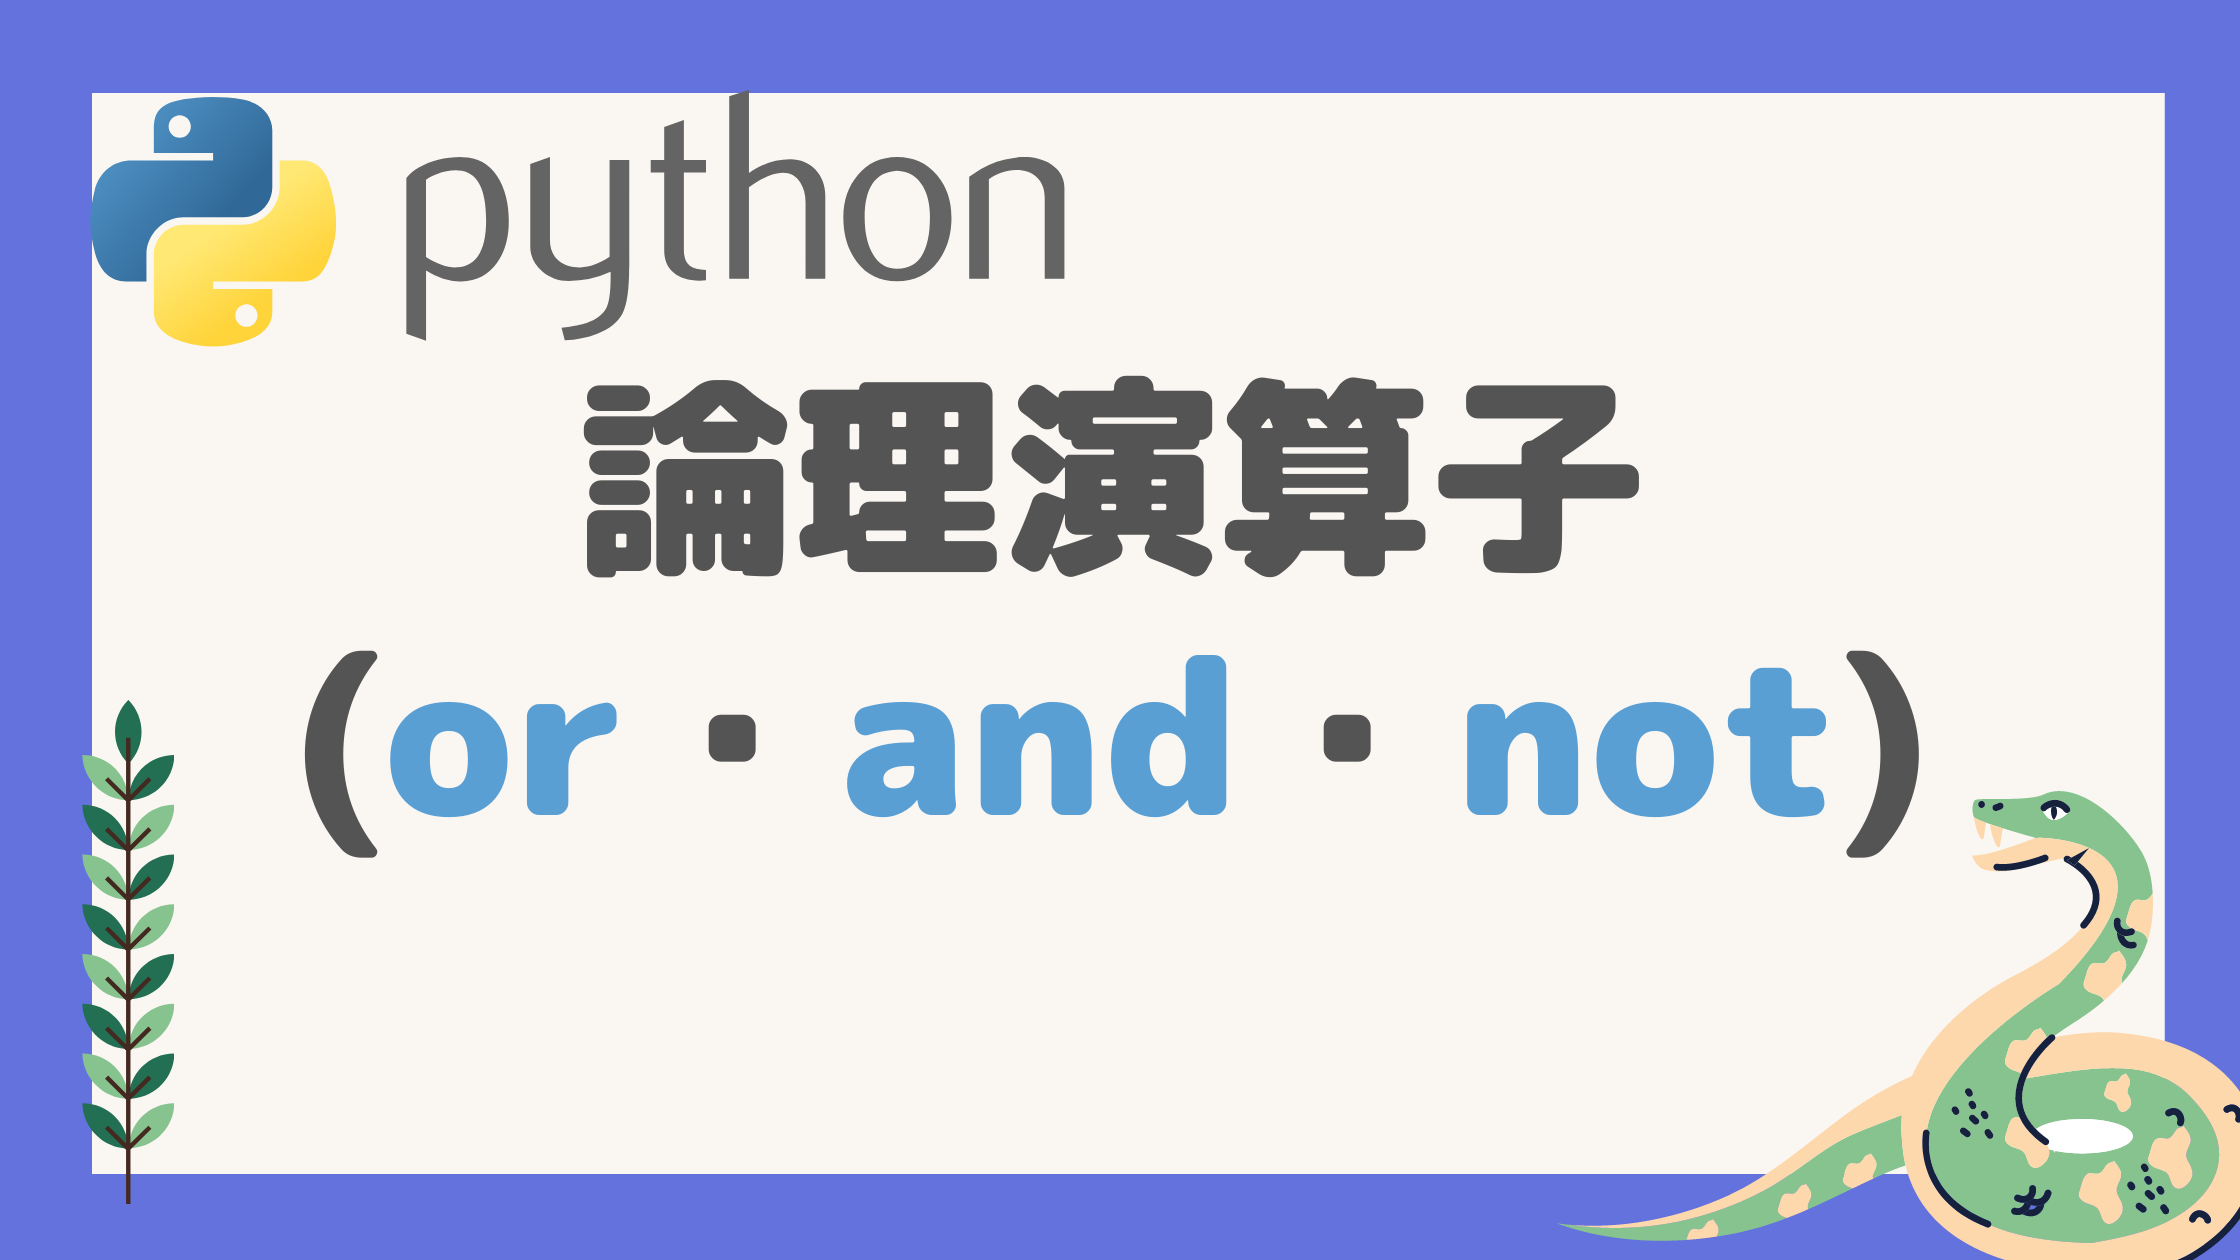 pythonの論理演算子の記事のアイキャッチ